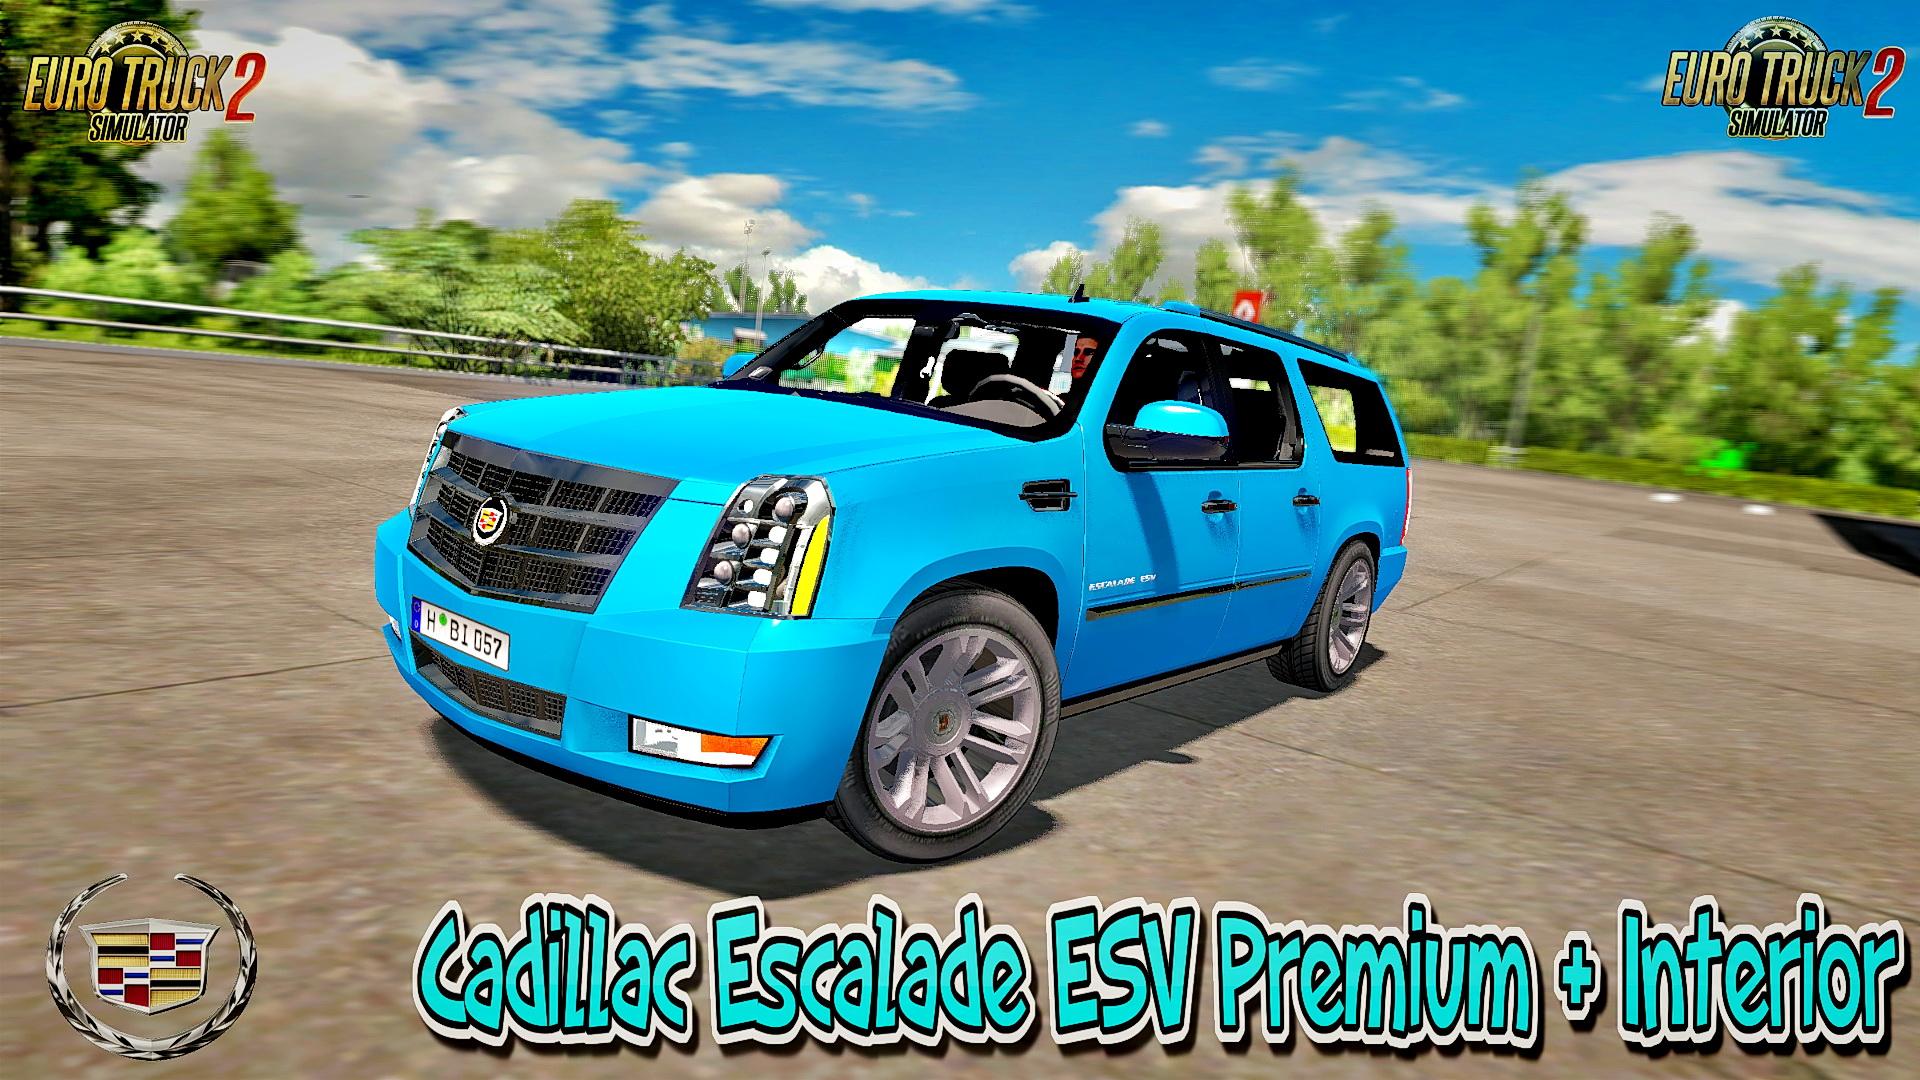 Cadillac Escalade ESV Premium 2012 + Interior v1.0 (1.27.x)